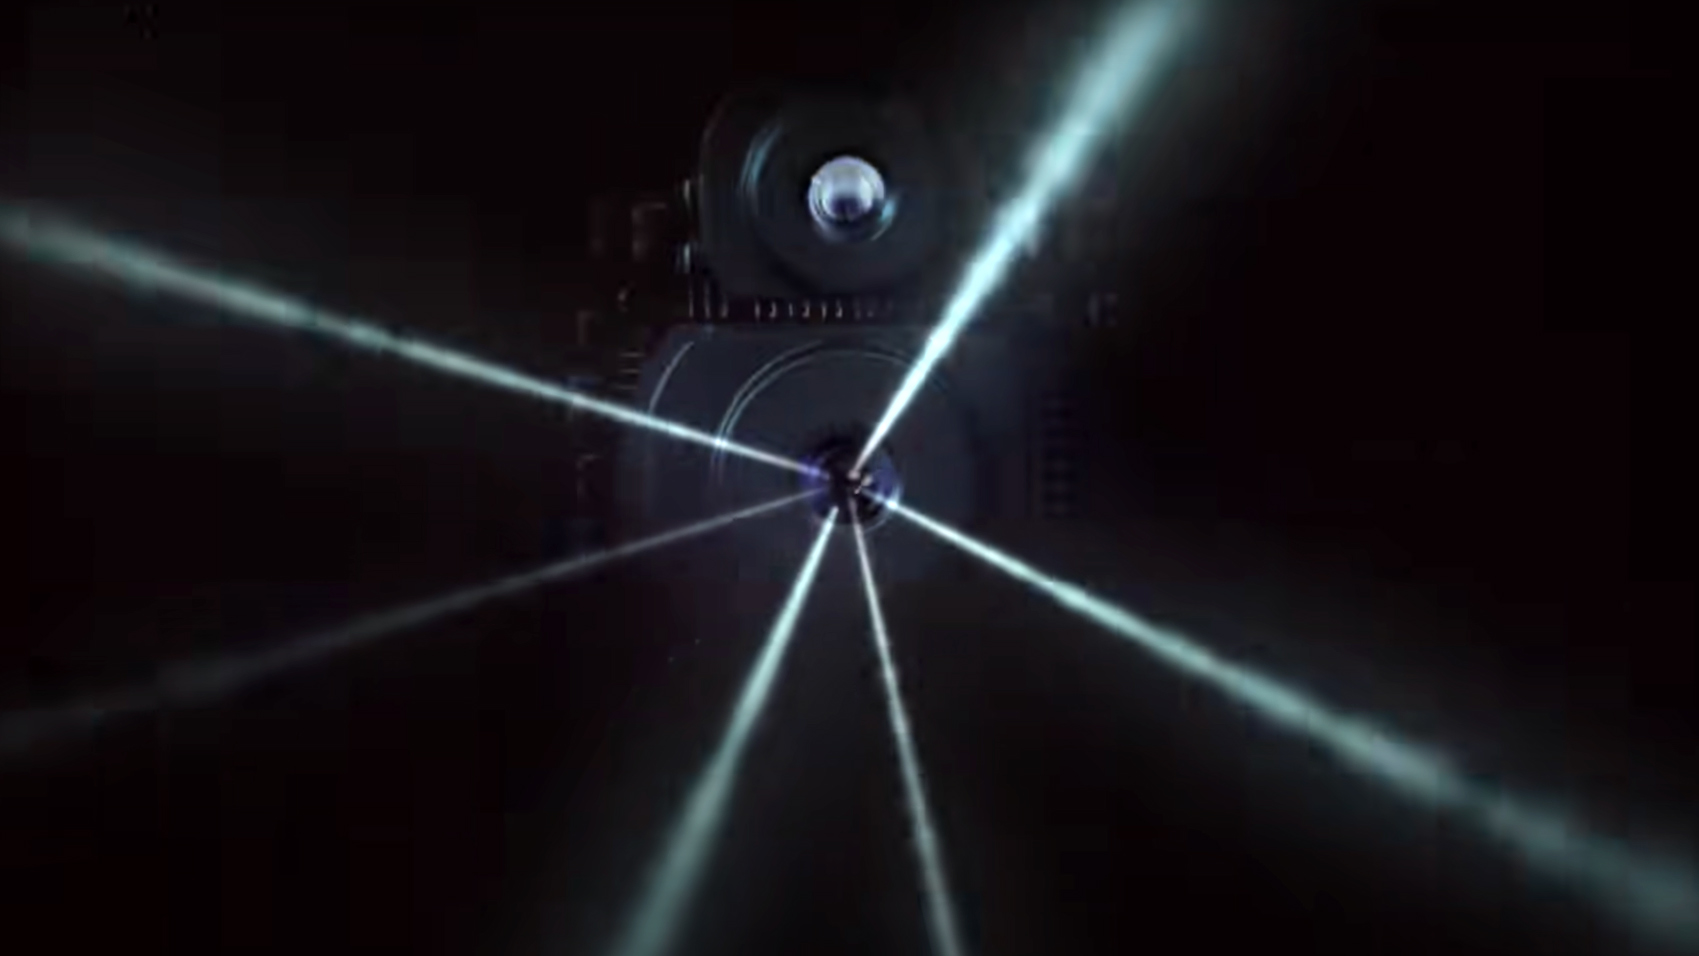 Laser beams firing out from a LiDAR scanner